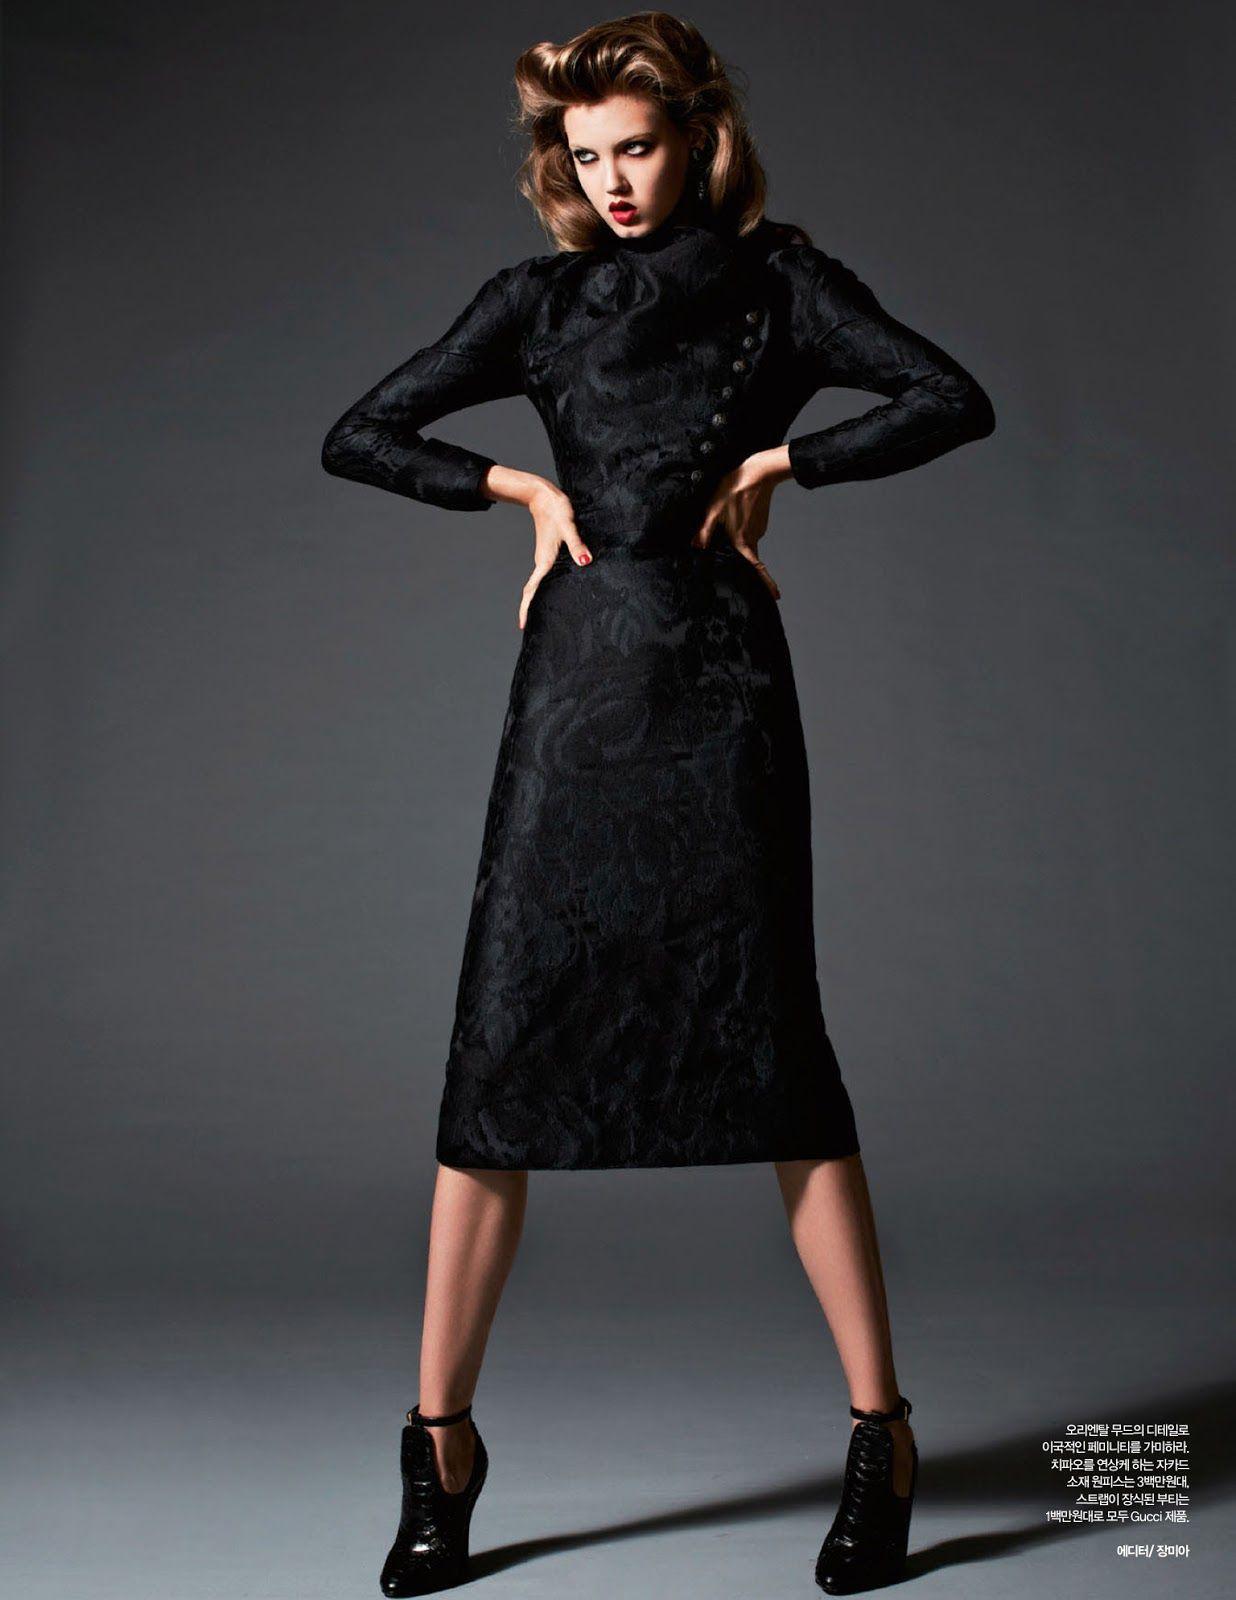 lady black: lindsey wixson by michael schwartz for harper's bazaar korea november 2012